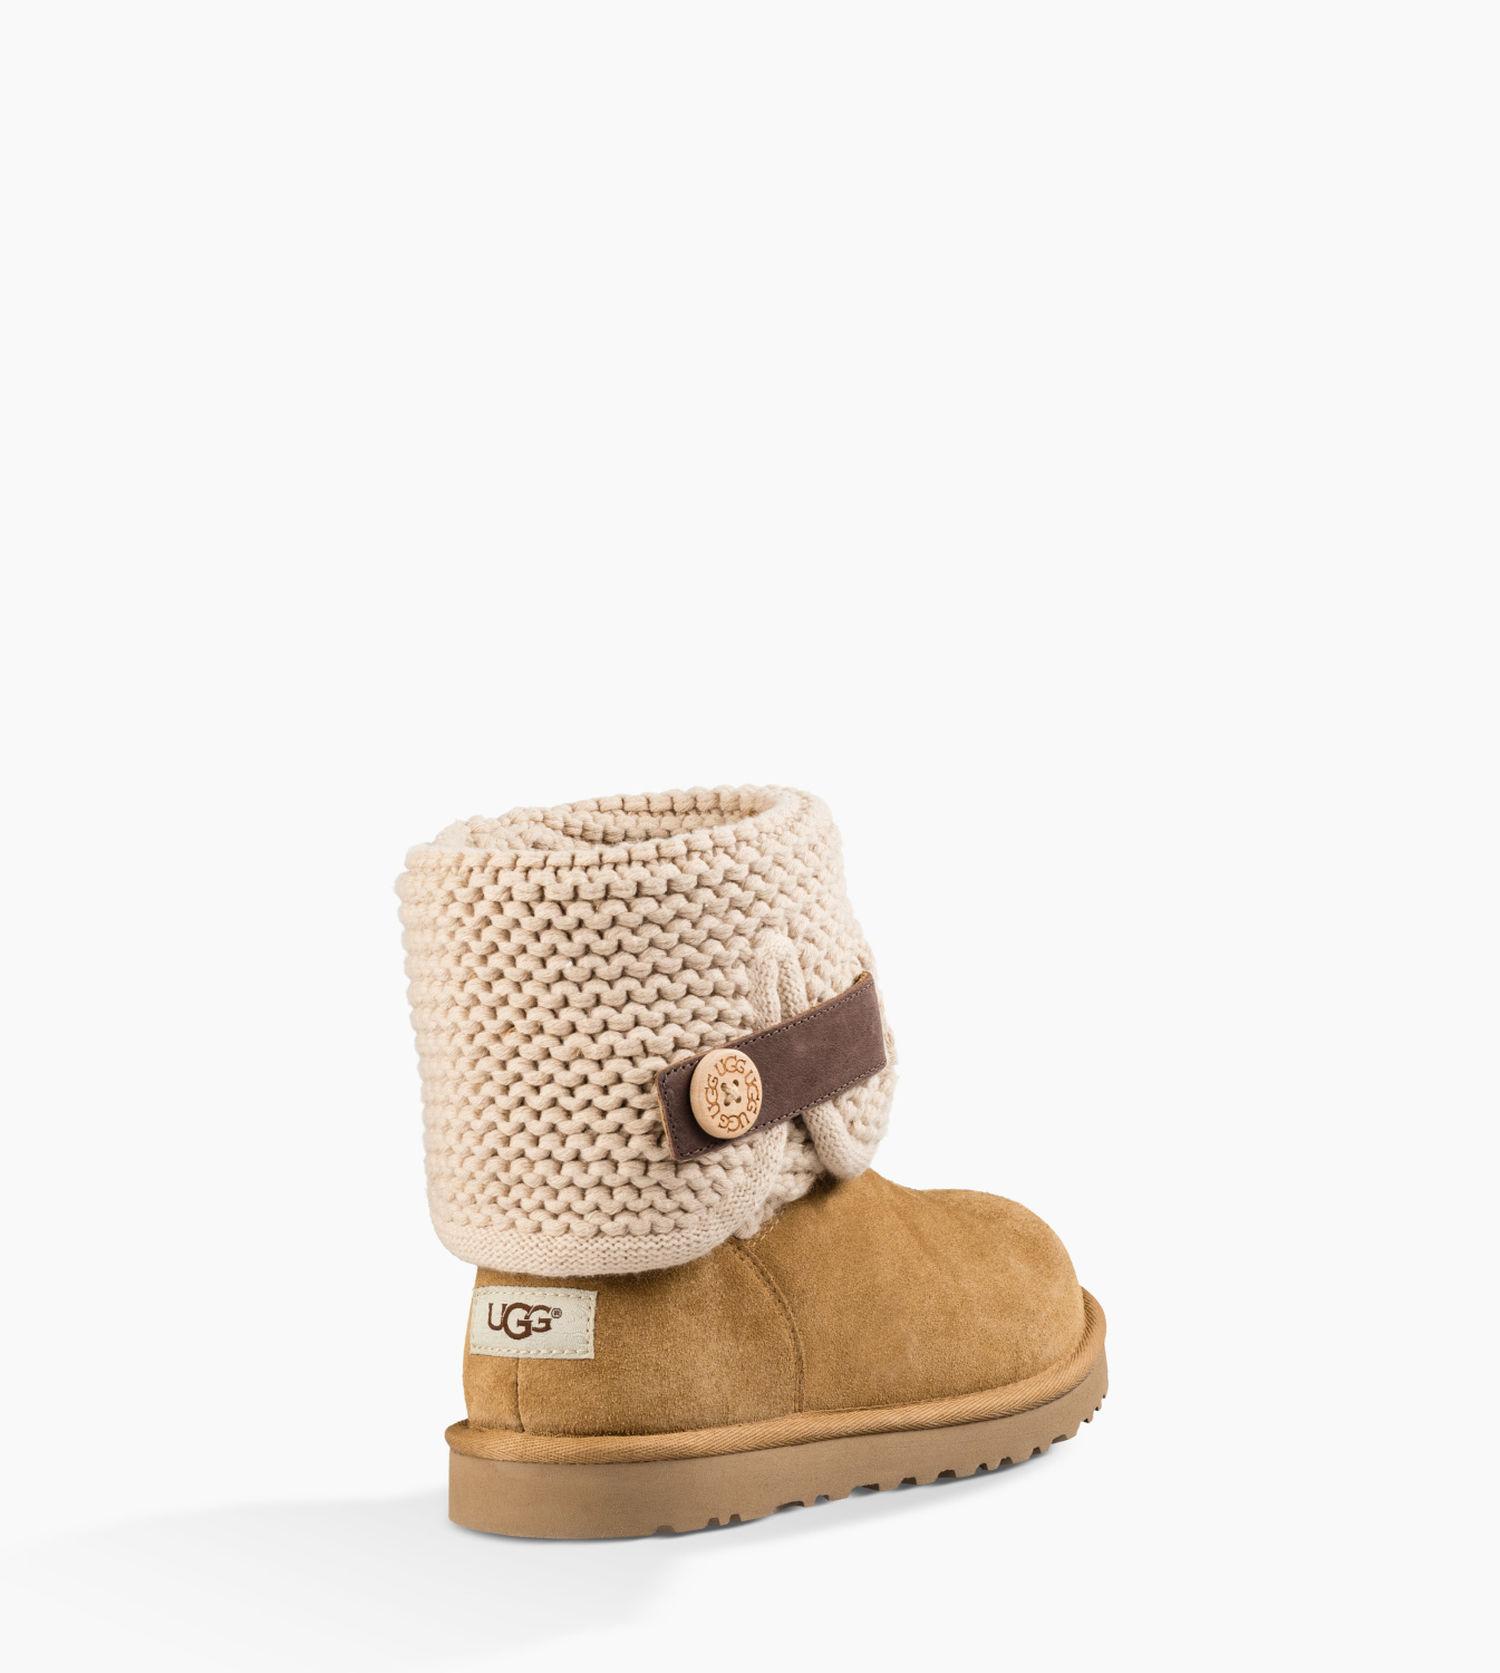 Ugg shaina womens boots 4